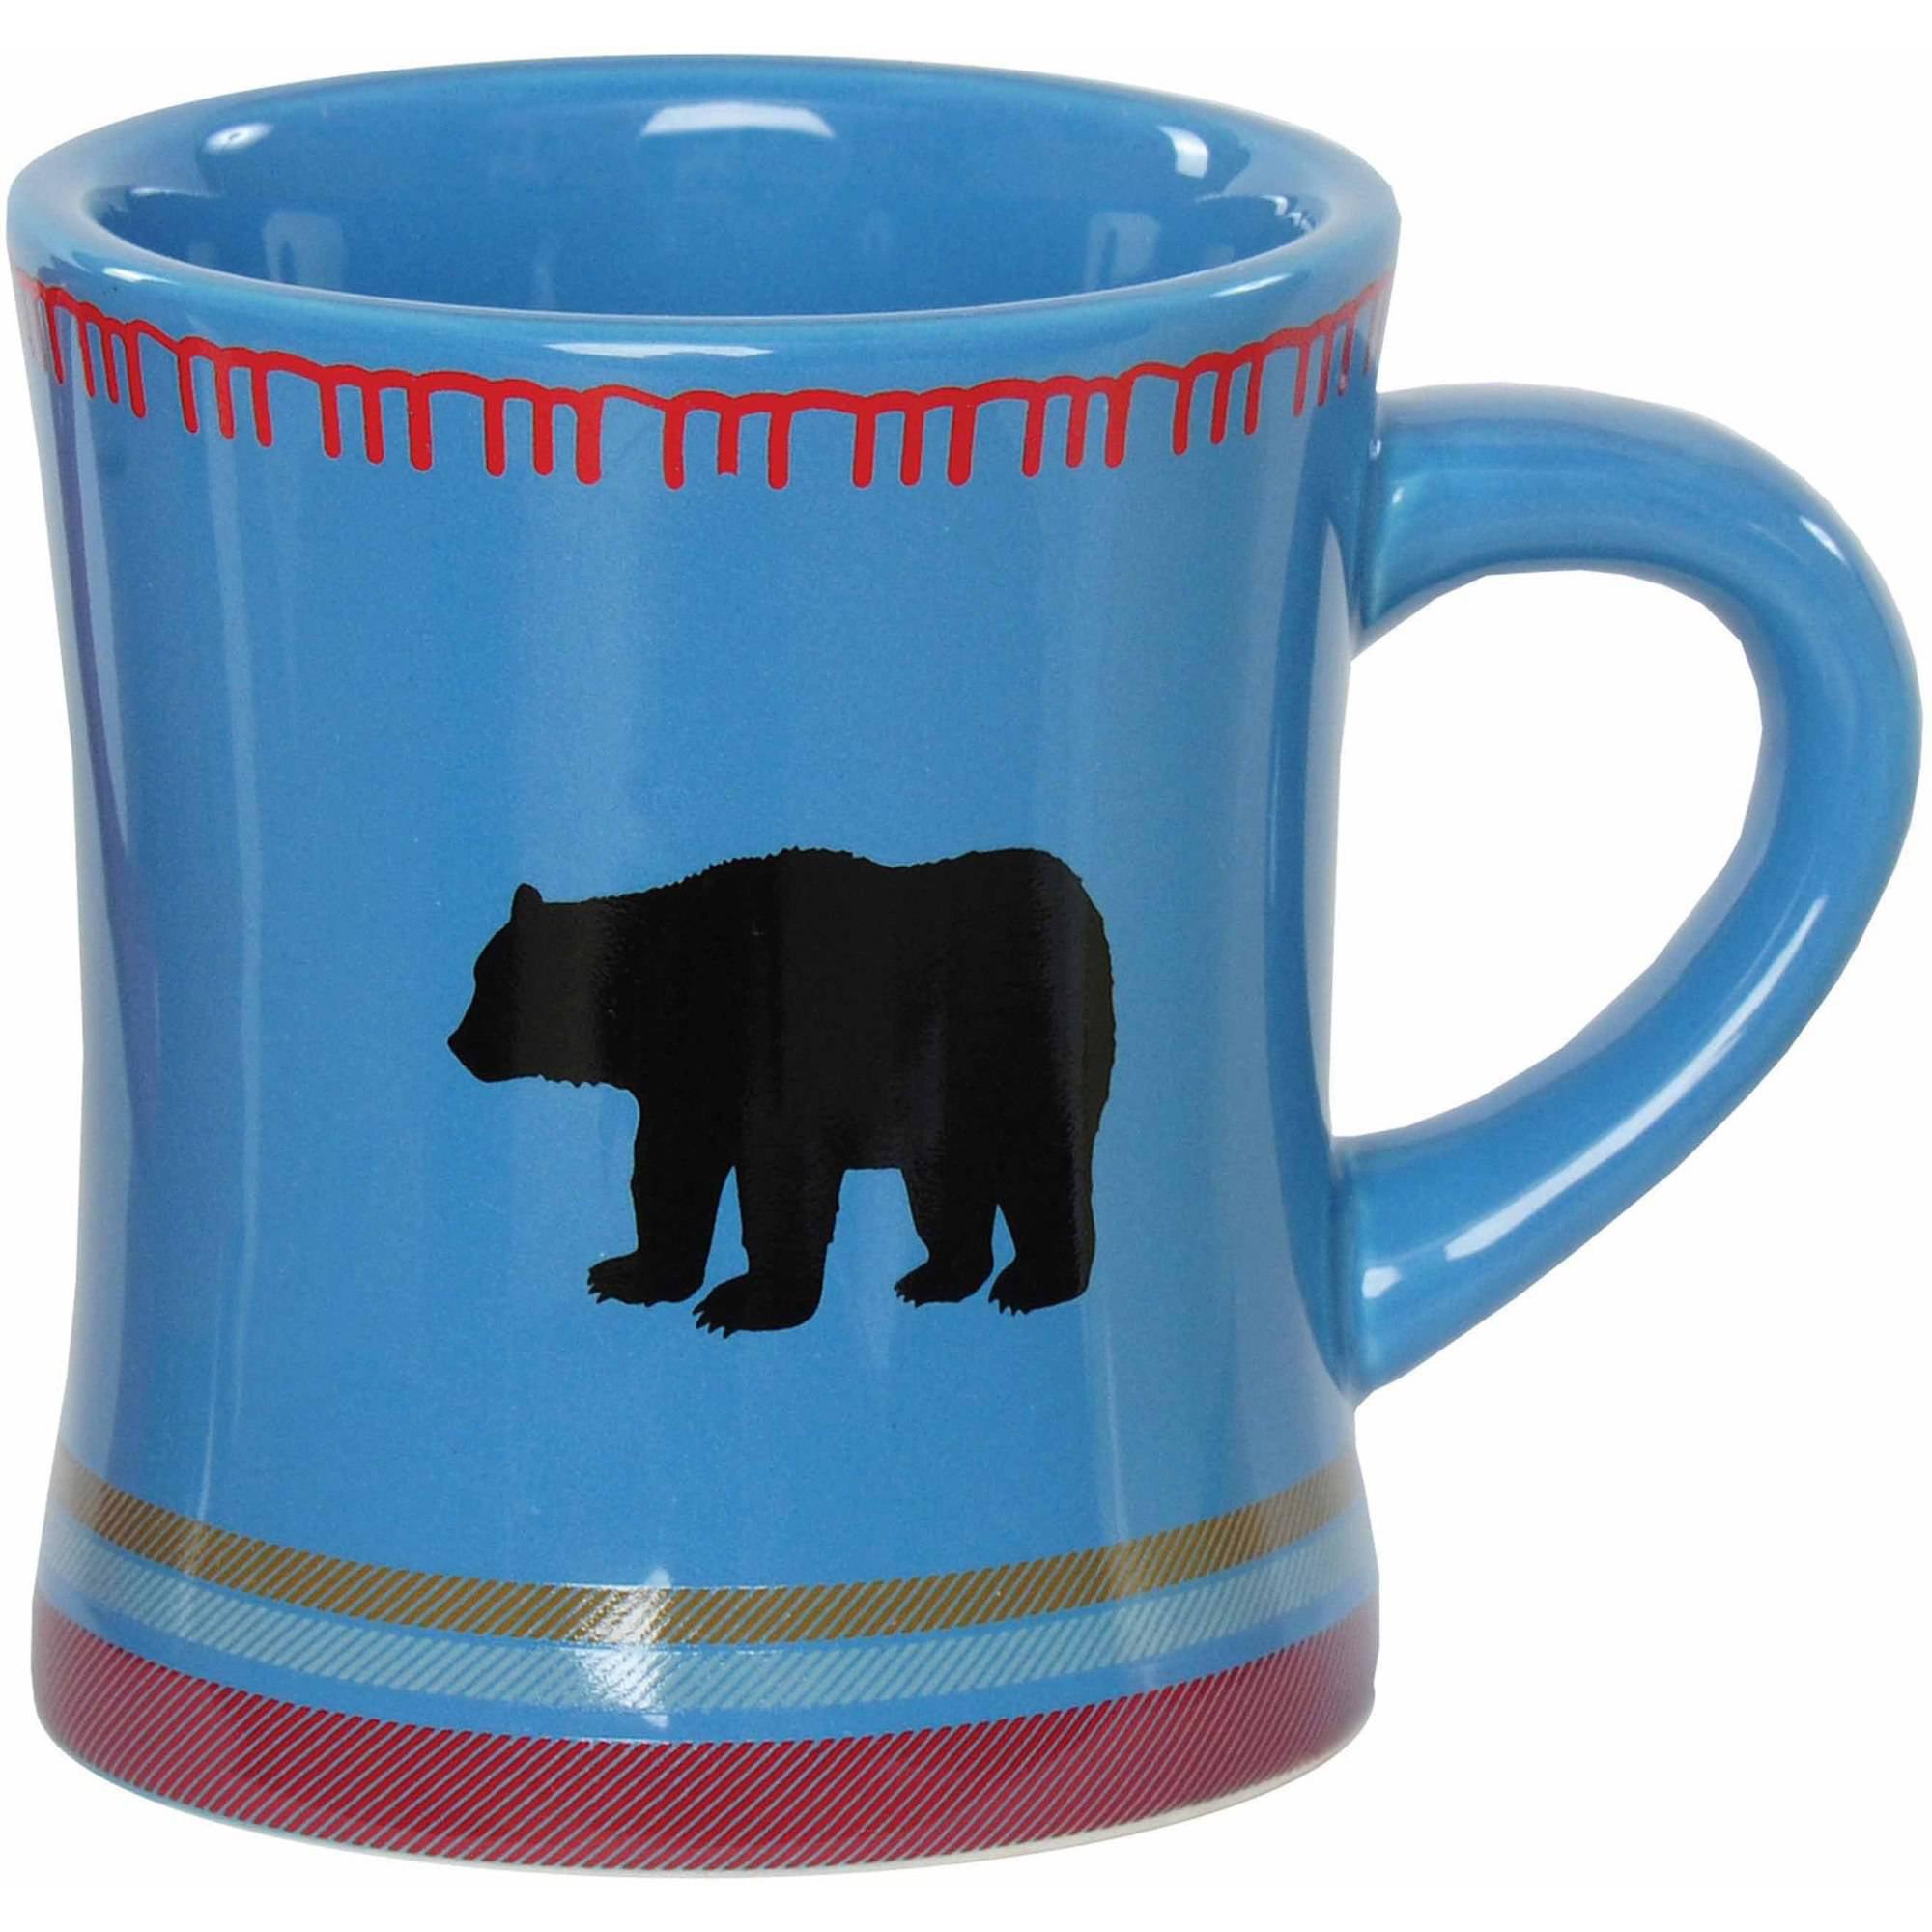 Image of GSI Outdoors 99171 Ceramic Mug, Bear